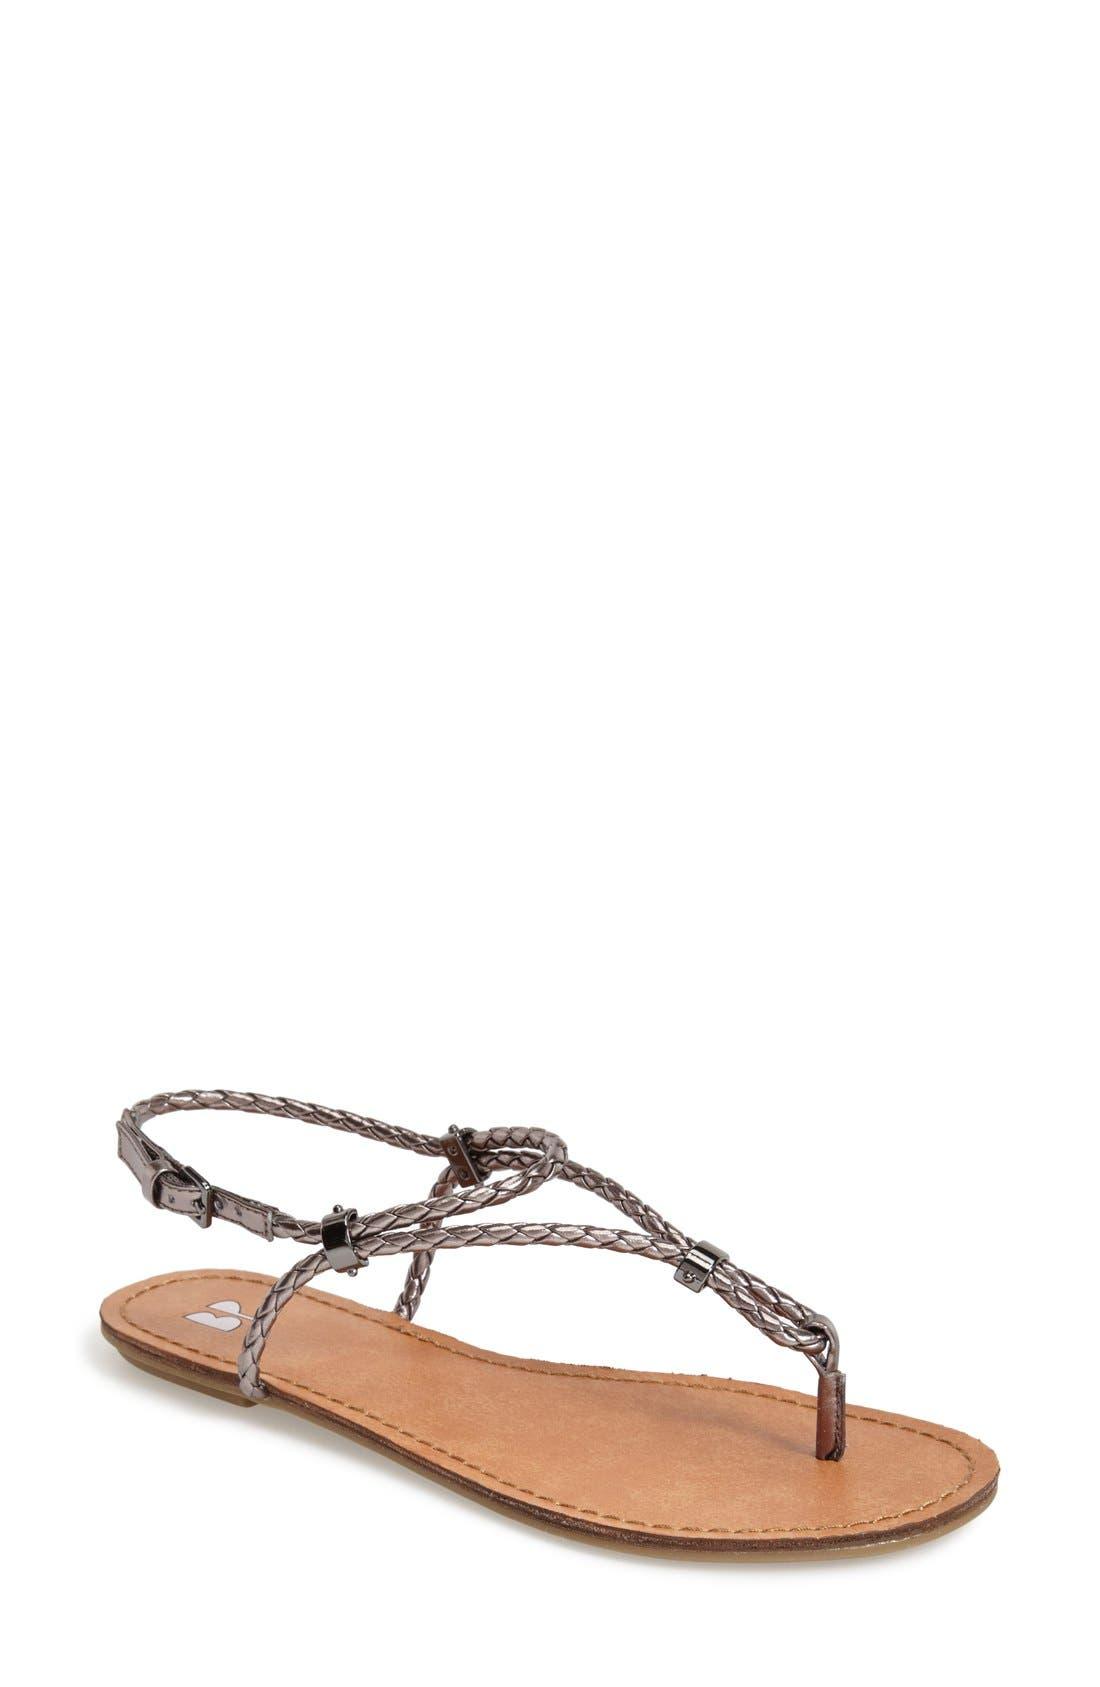 Alternate Image 1 Selected - BP. 'Mantra' Flat Thong Sandal (Women)